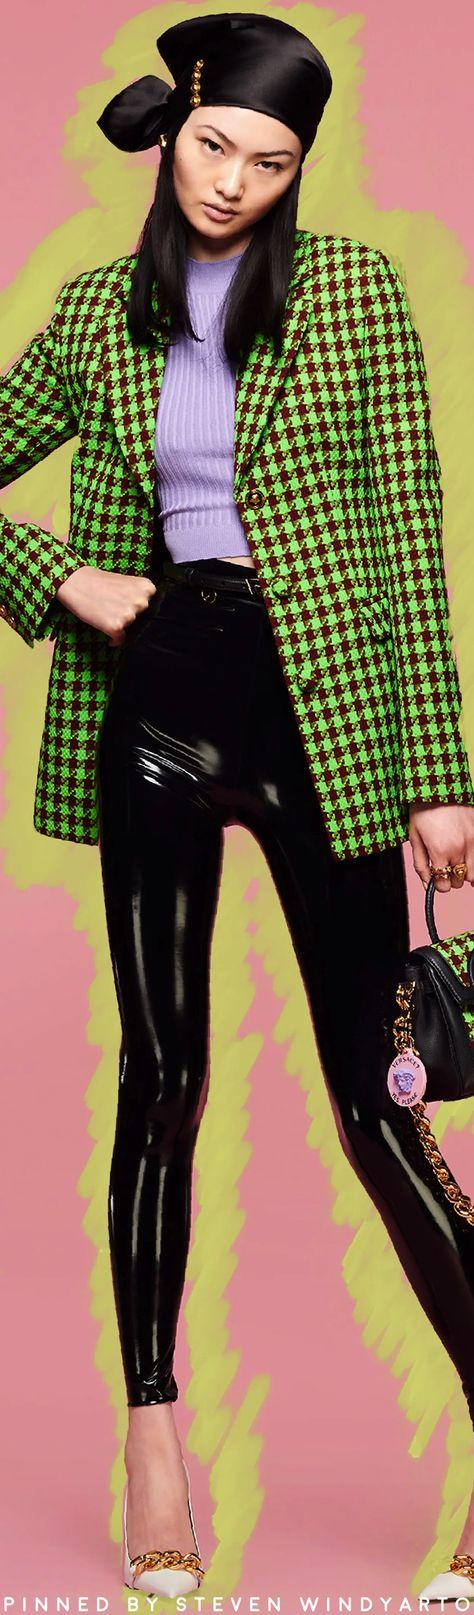 Versace Resort 2022 Lookbook #resort2022 #cruise2022 #r22 #womenswear #donatellaversace